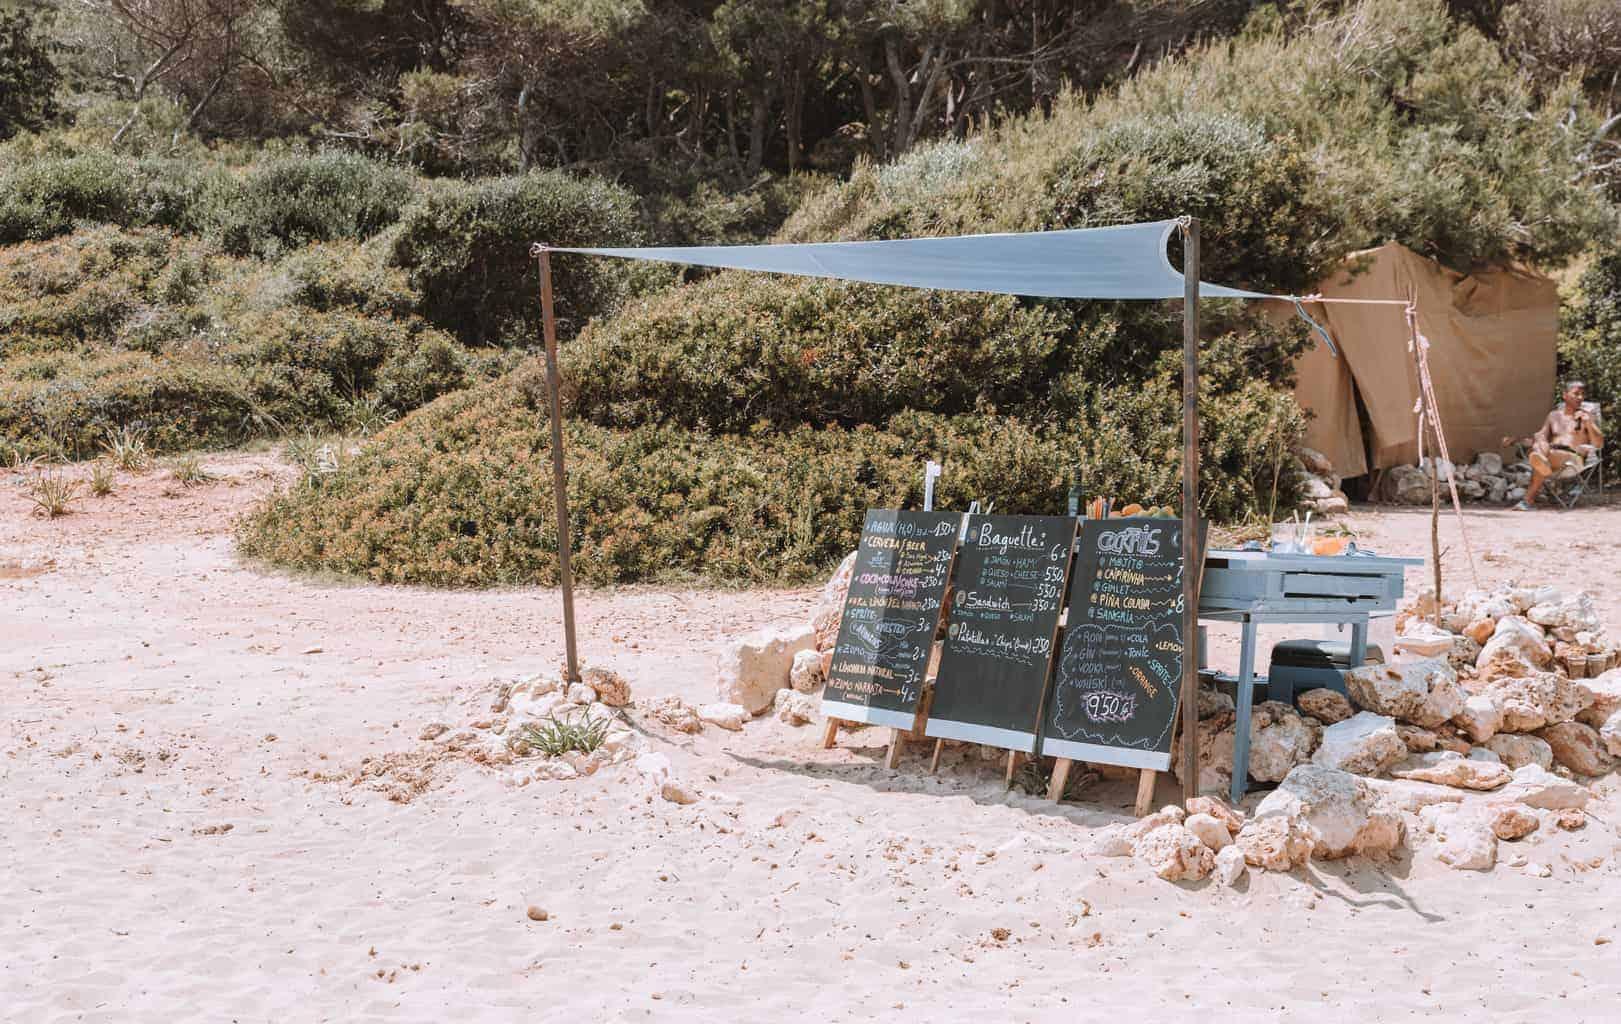 Beach bar in Mallorca, Spain